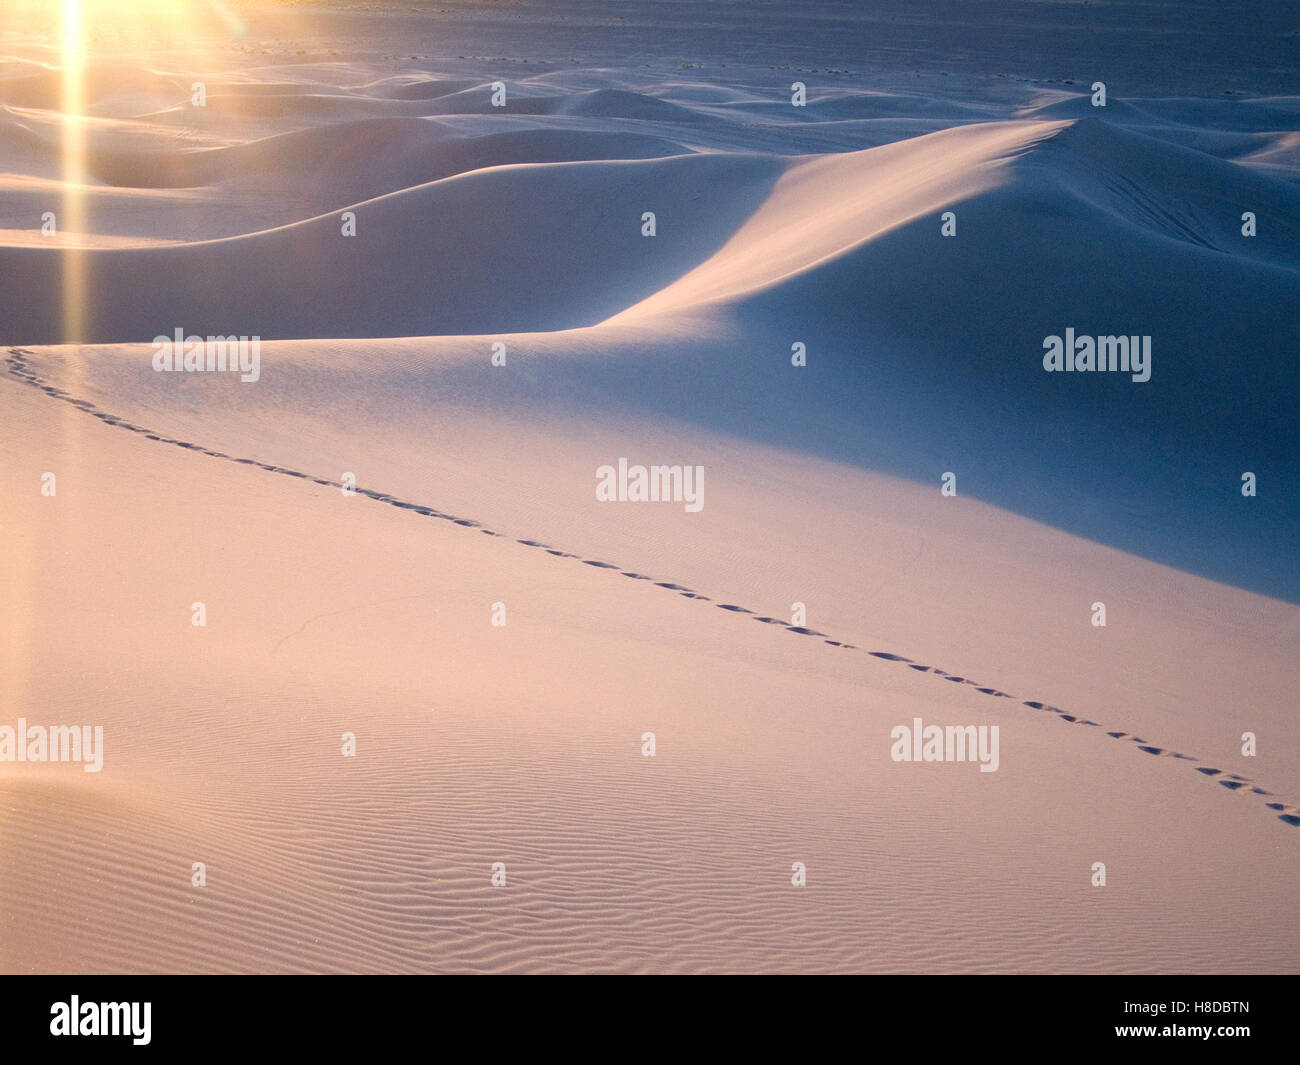 Desert Sand Dunes with Footprints - Stock Image